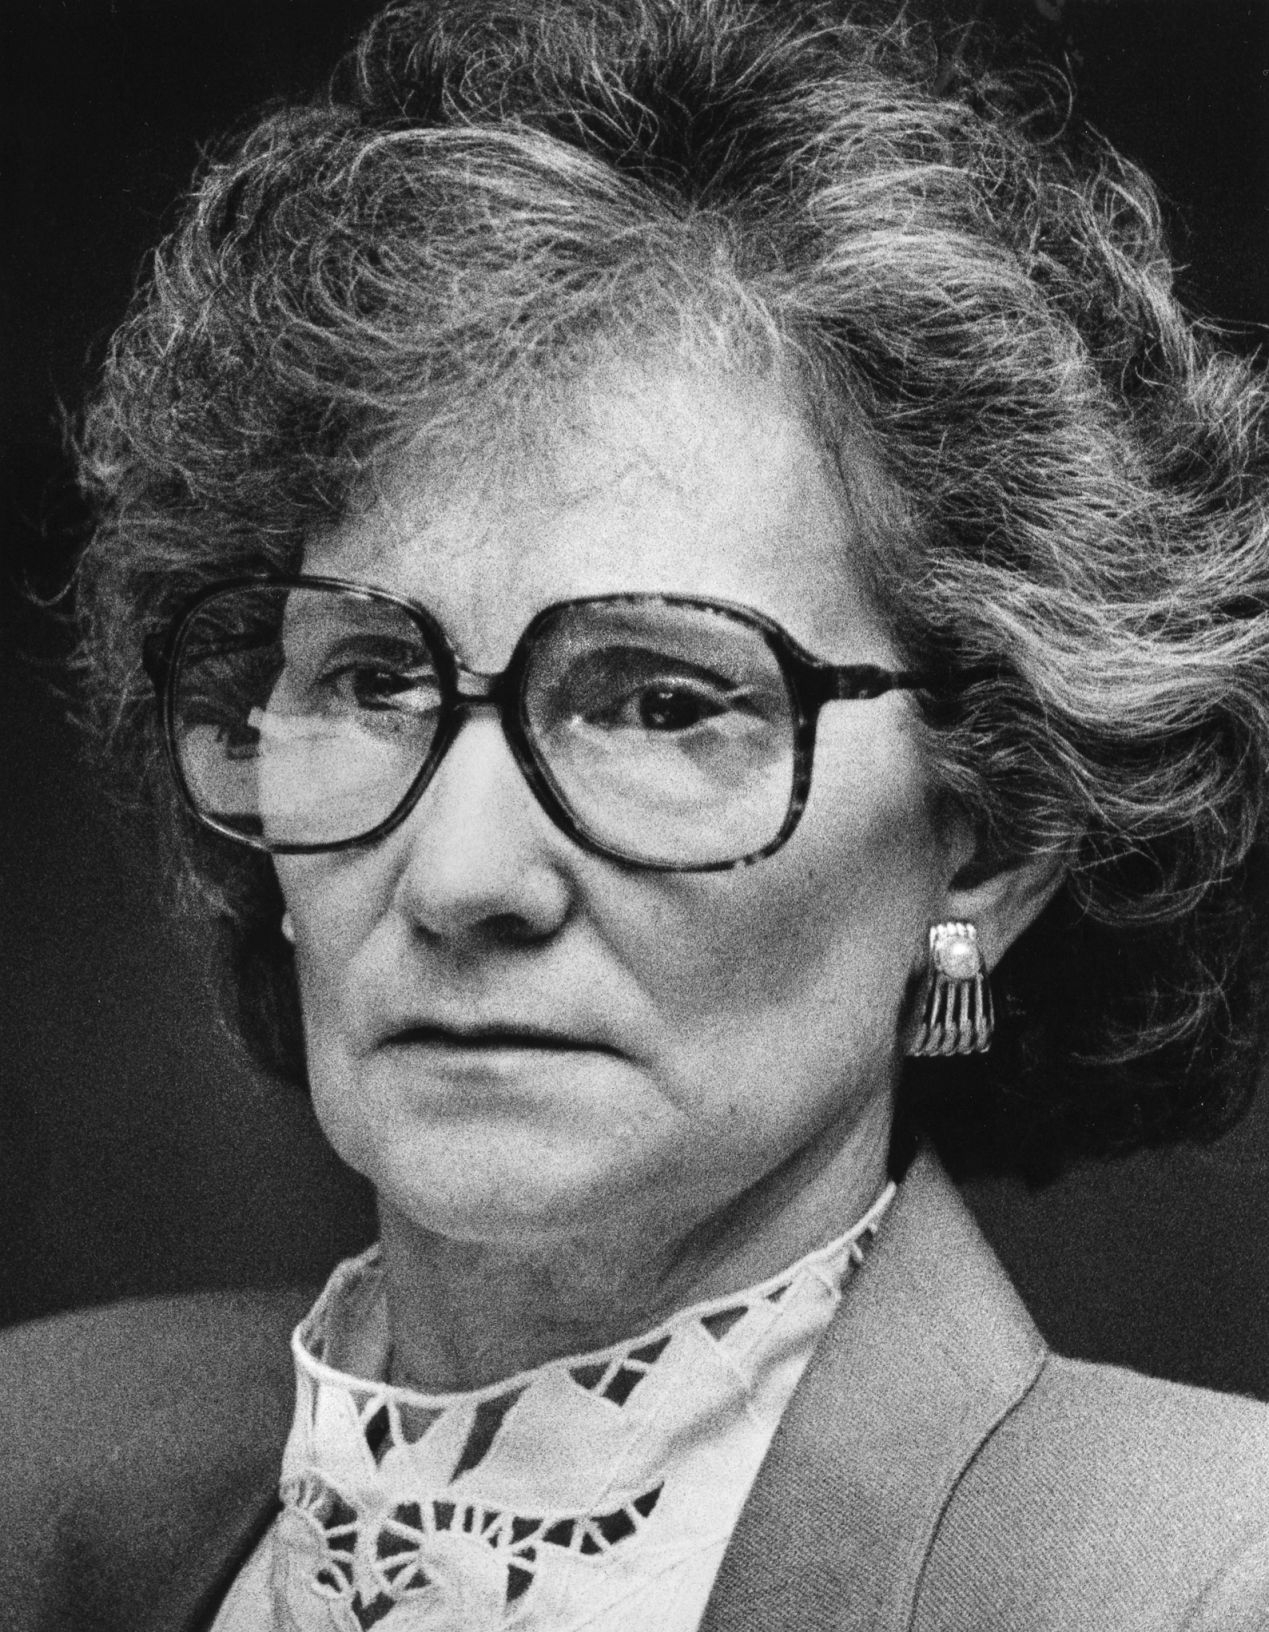 Blanche Forsythe